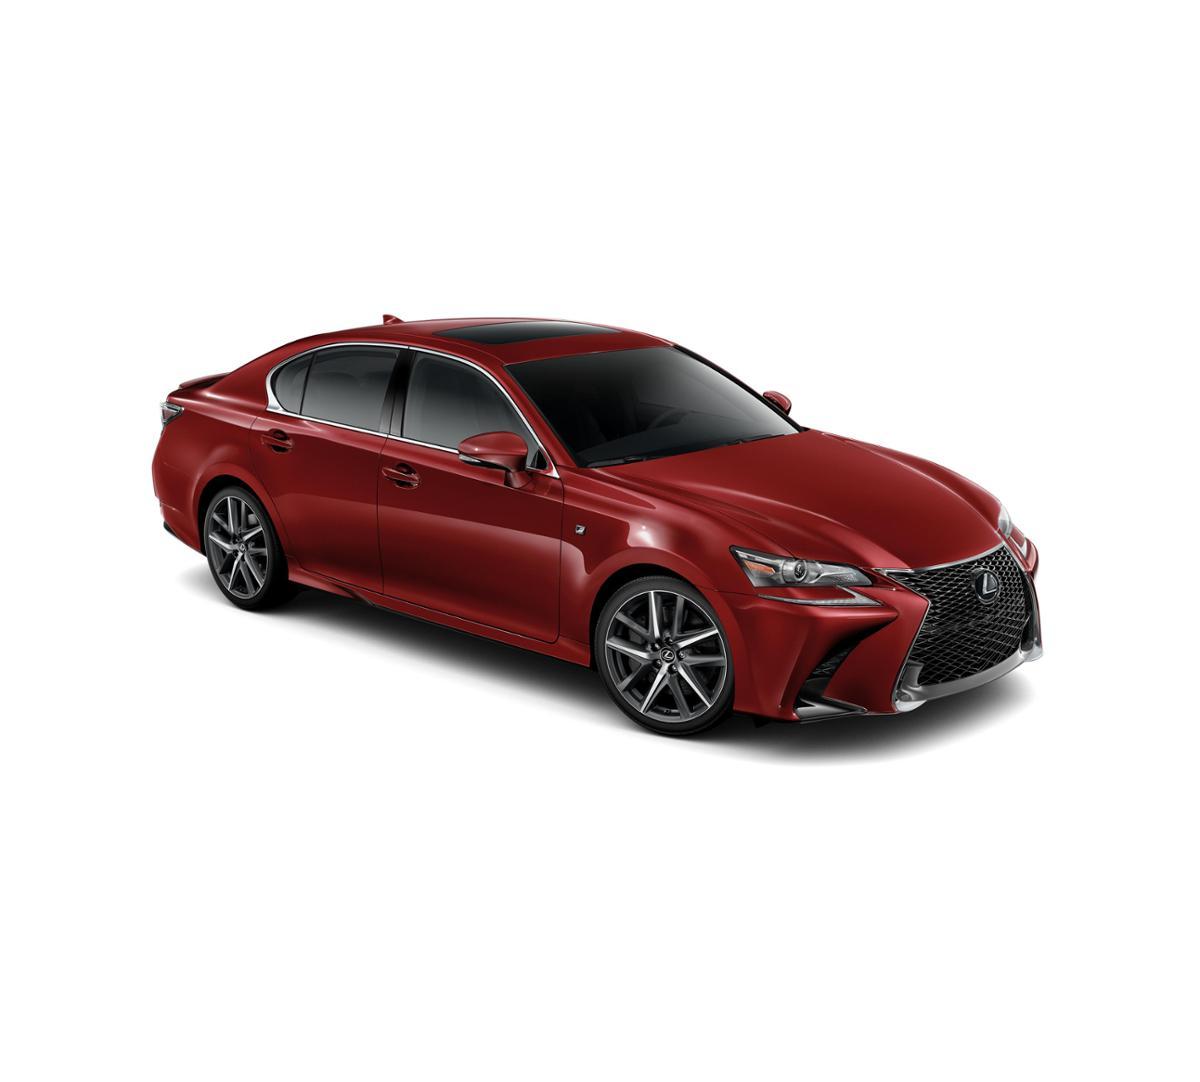 Lexus Gs For Sale: New 2019 Lexus GS 350 For Sale In Escondido, CA